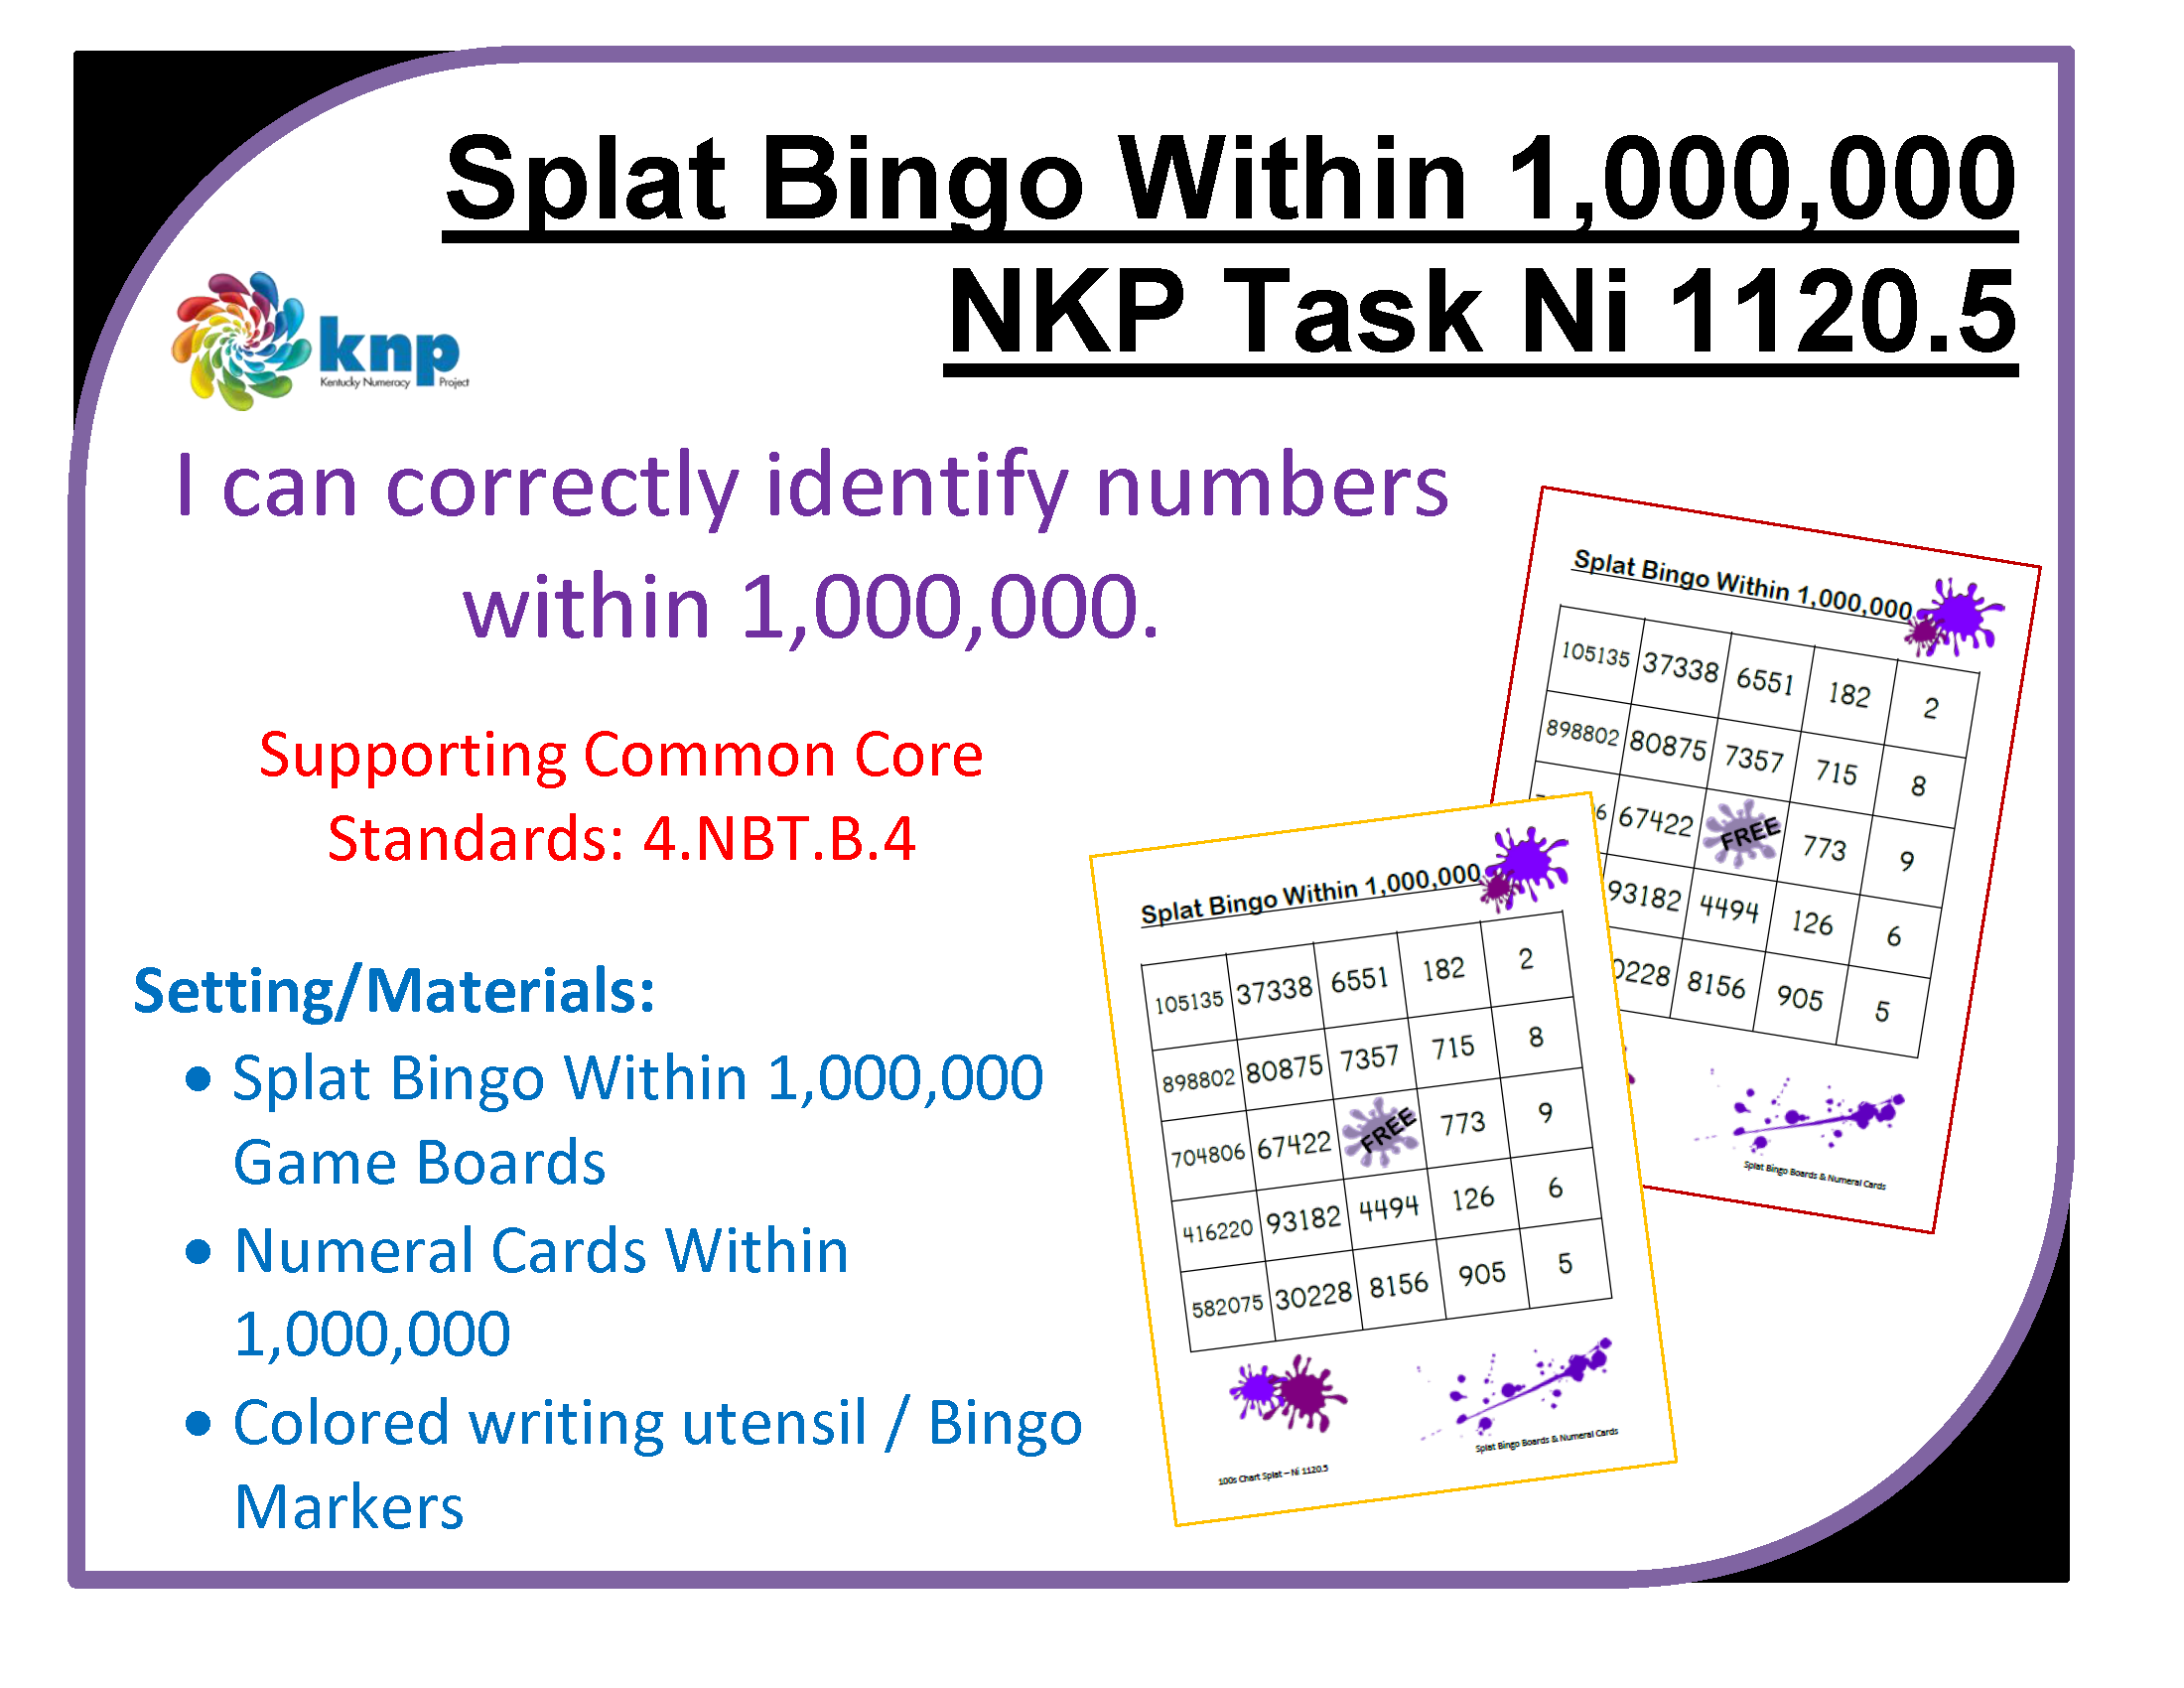 Splat Bingo Within 1 000 000